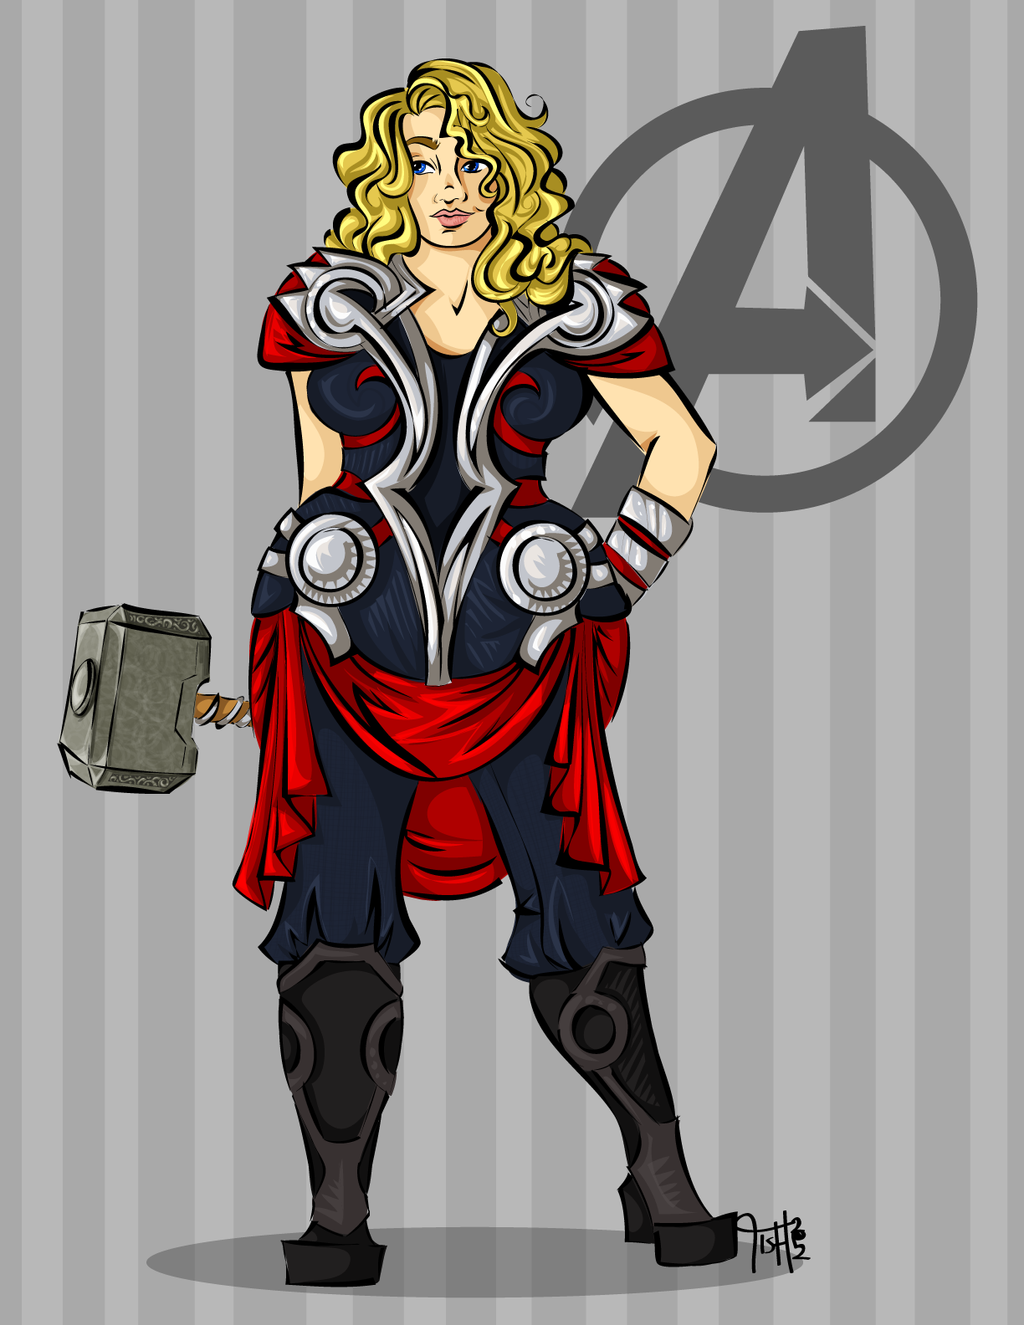 Torny Thor by labrattish